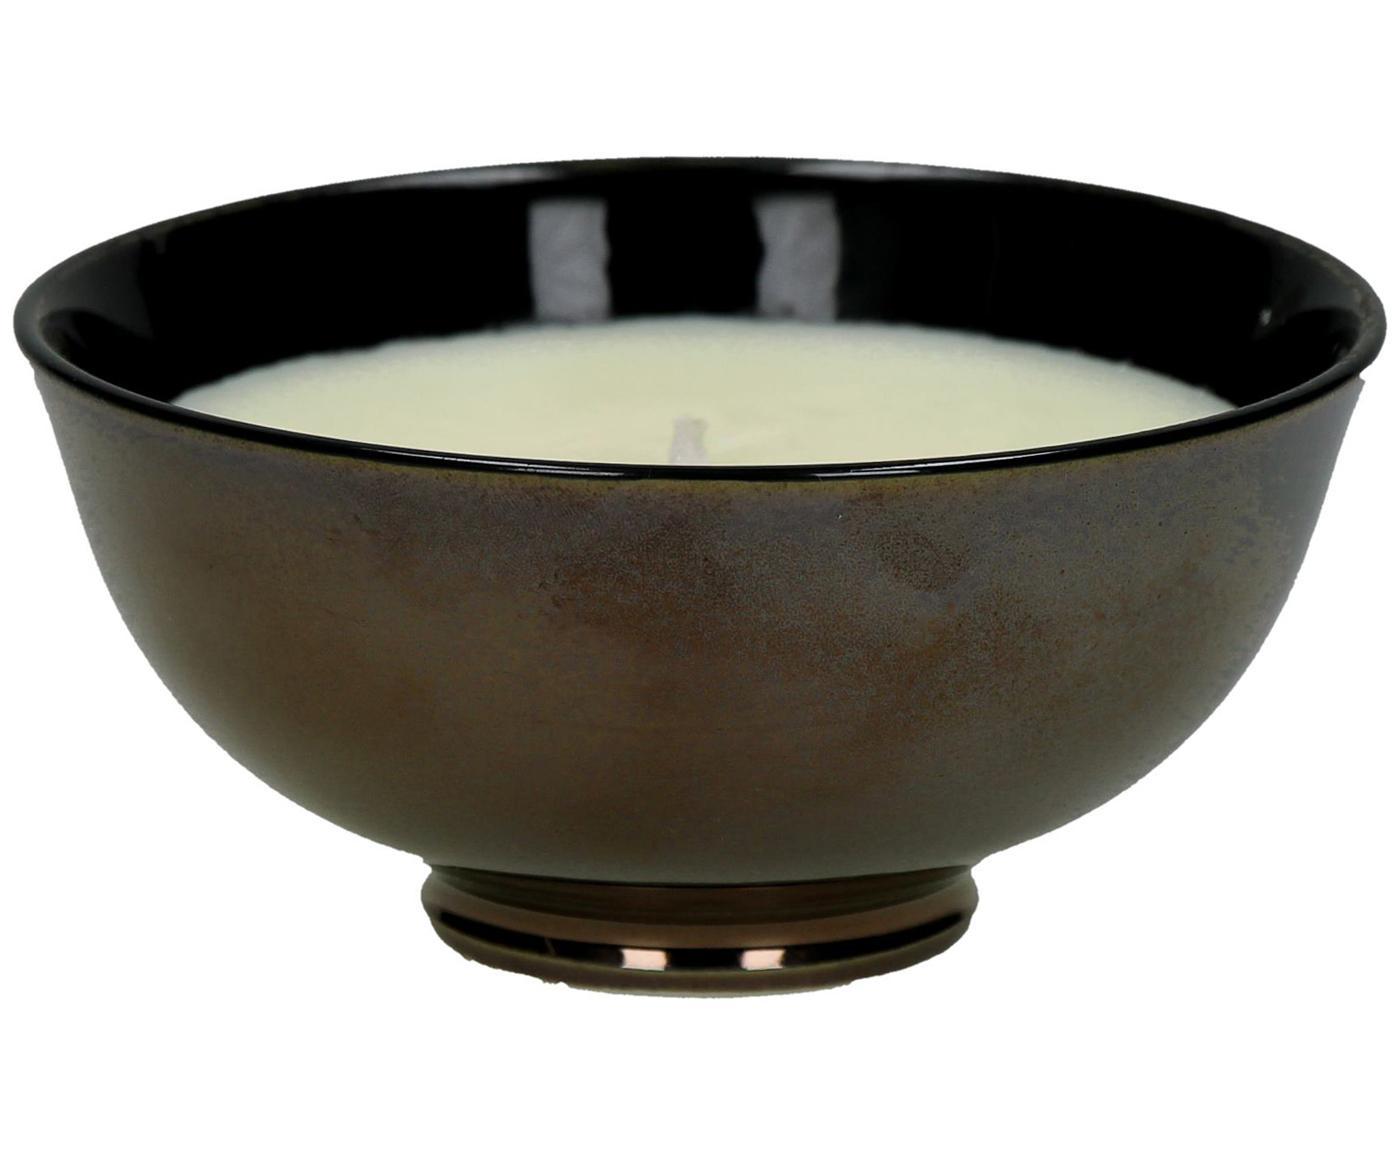 Candela profumata Black Yasmin (gelsomino), Contenitore: porcellana, Contenitore: marrone Candela: bianco, Ø 12 x Alt. 6 cm